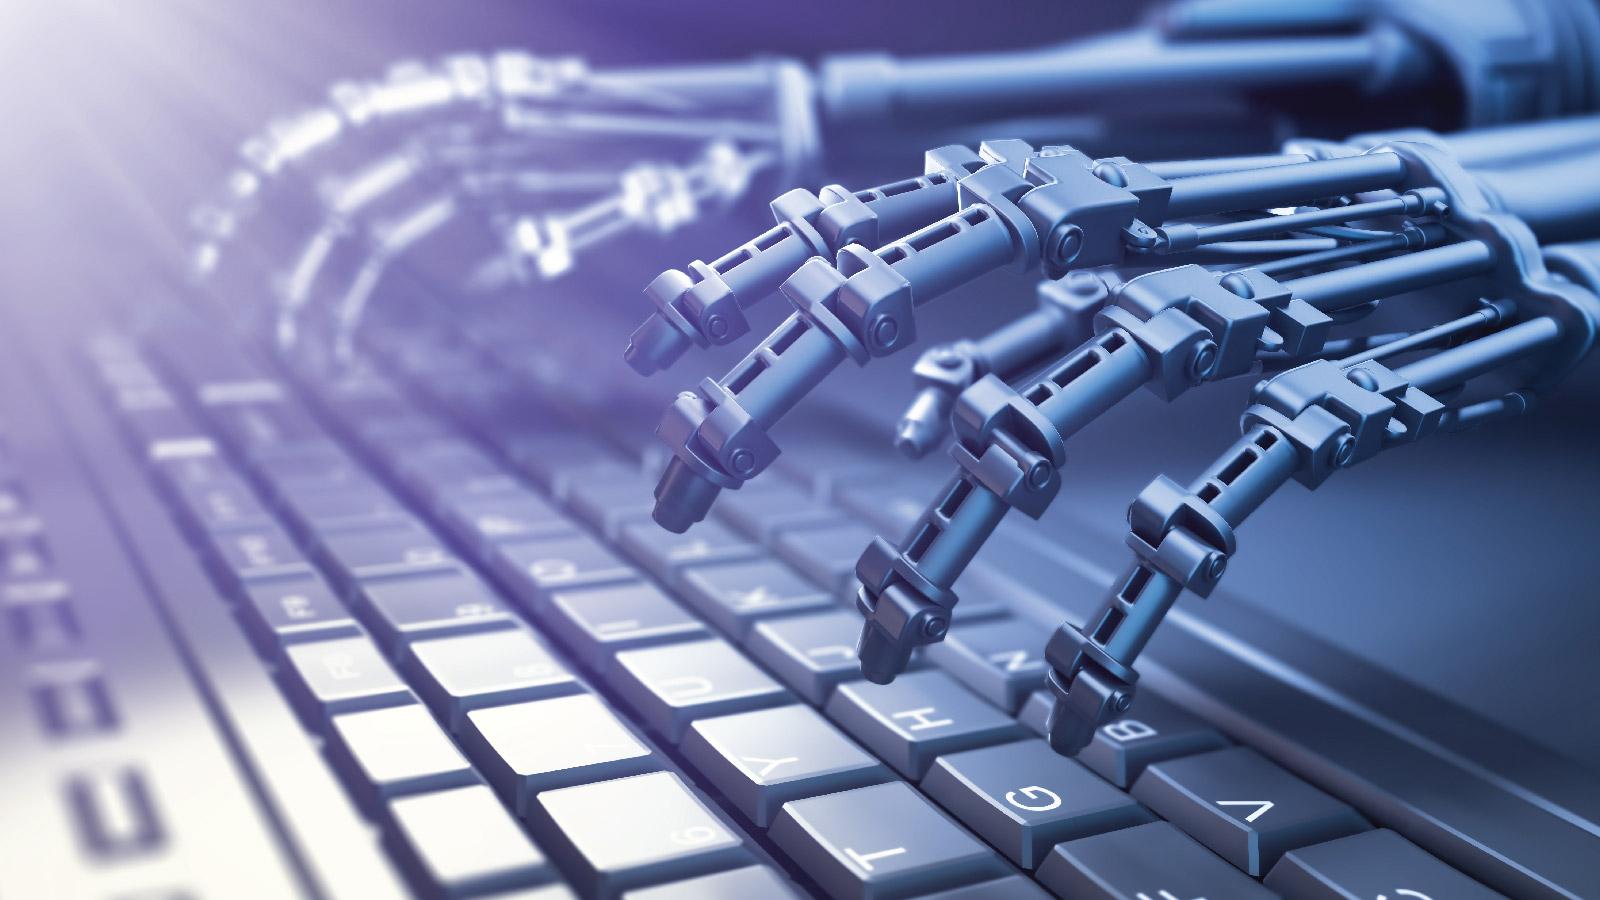 CEO, CIO, CTO, IA, Intelligent Automation, Automation, Artificial Intelligence C-suites, CEO, Intelligent Automation, Automation, Artificial Intelligence, Forrester, SAP, Oracle, Salesforce, CFO, Robotic Process Automation, RPA